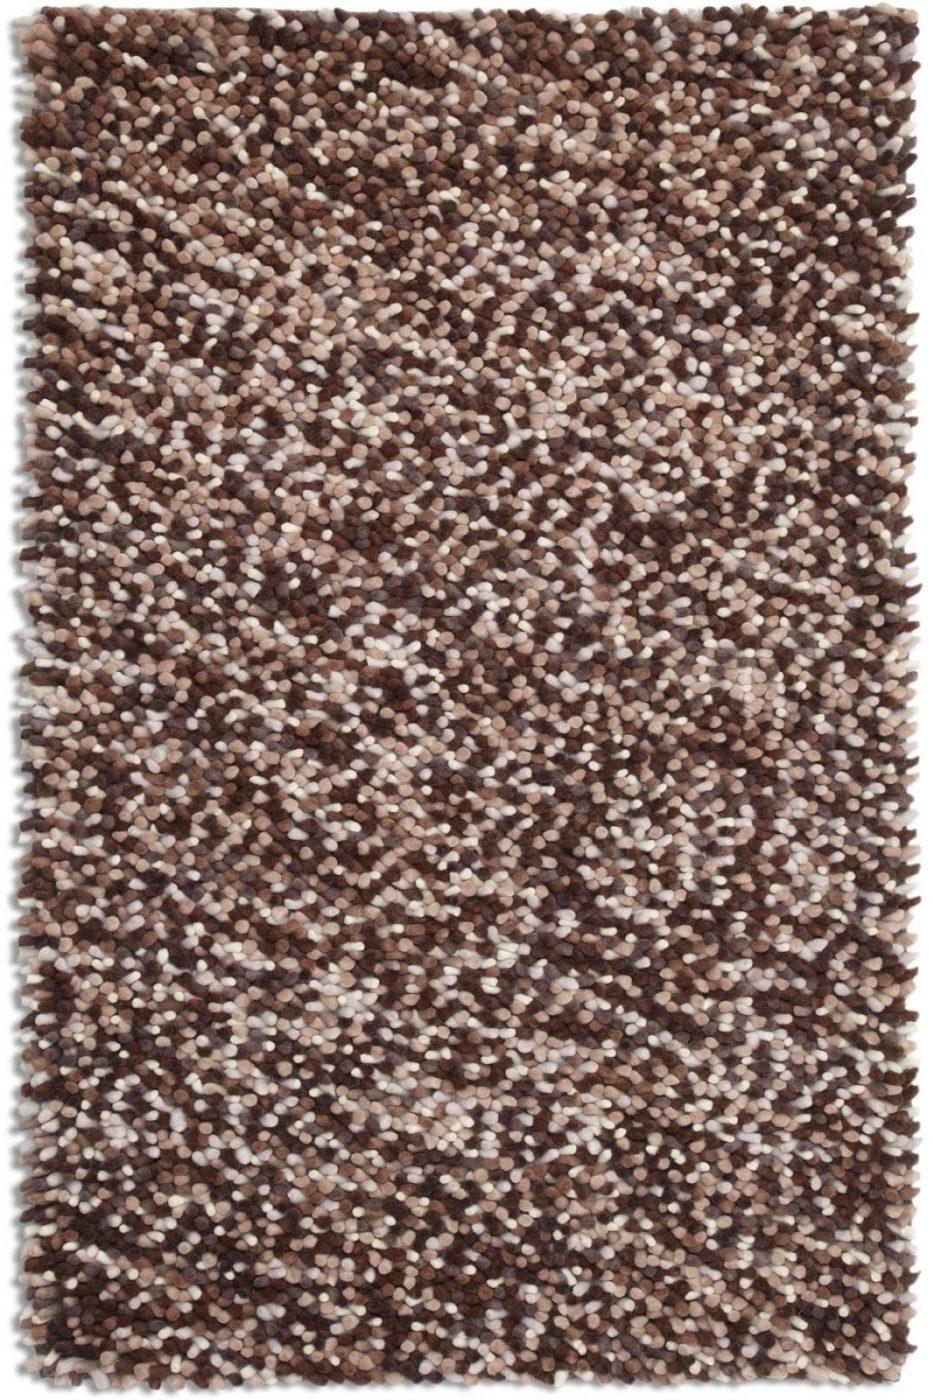 Beans BEA03 | Plantation Rug Company | Best at Flooring